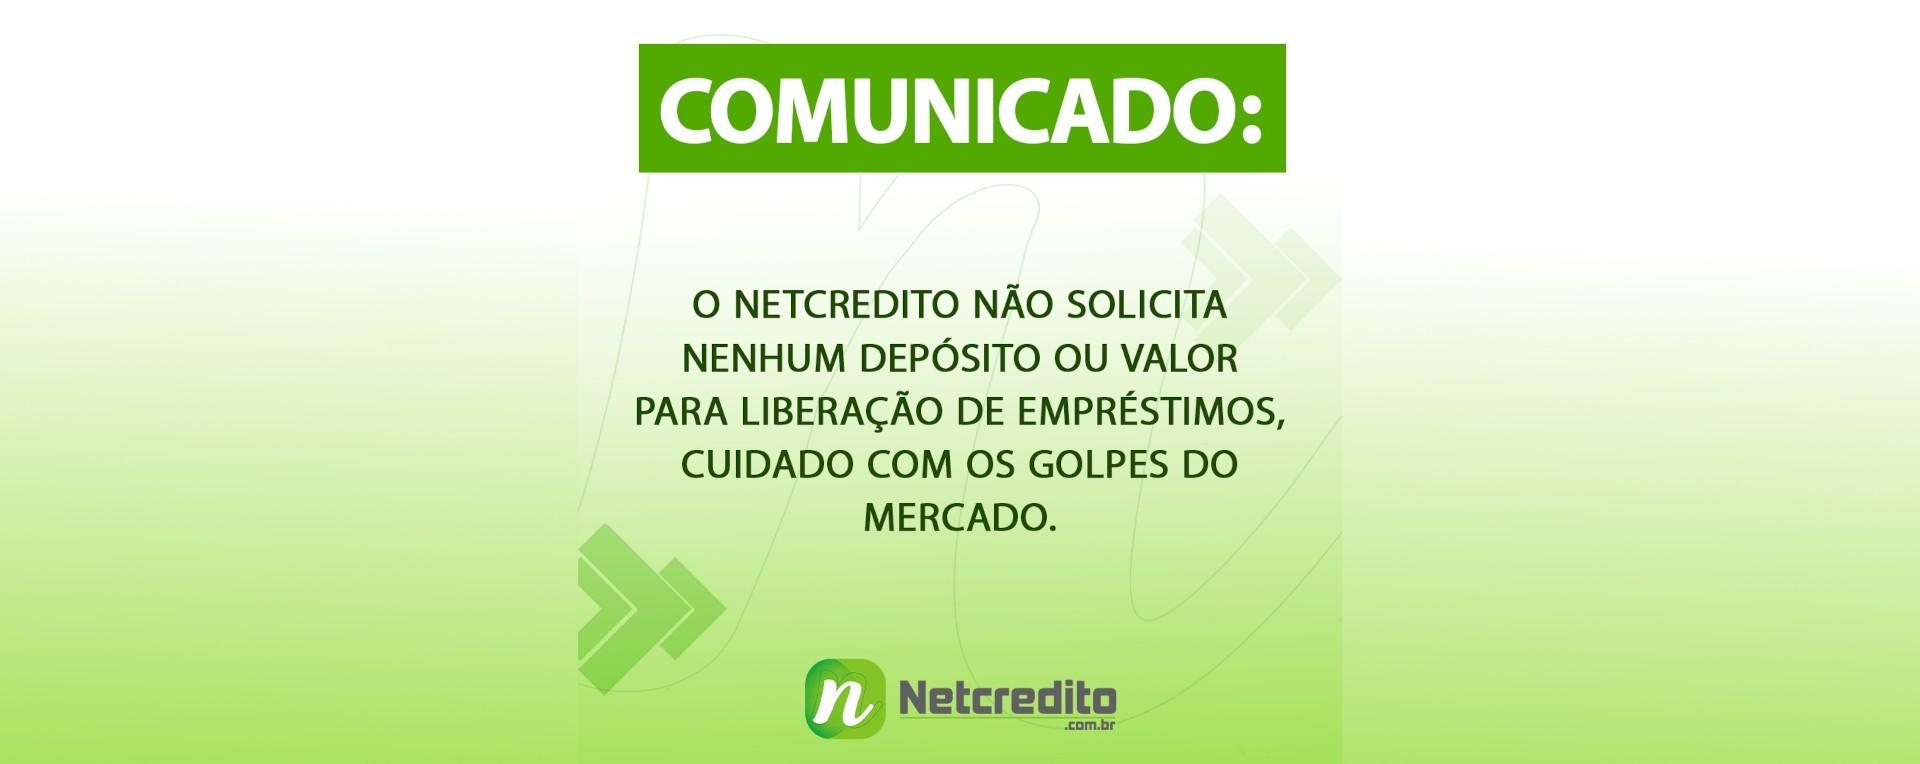 Comunicado Netcredito